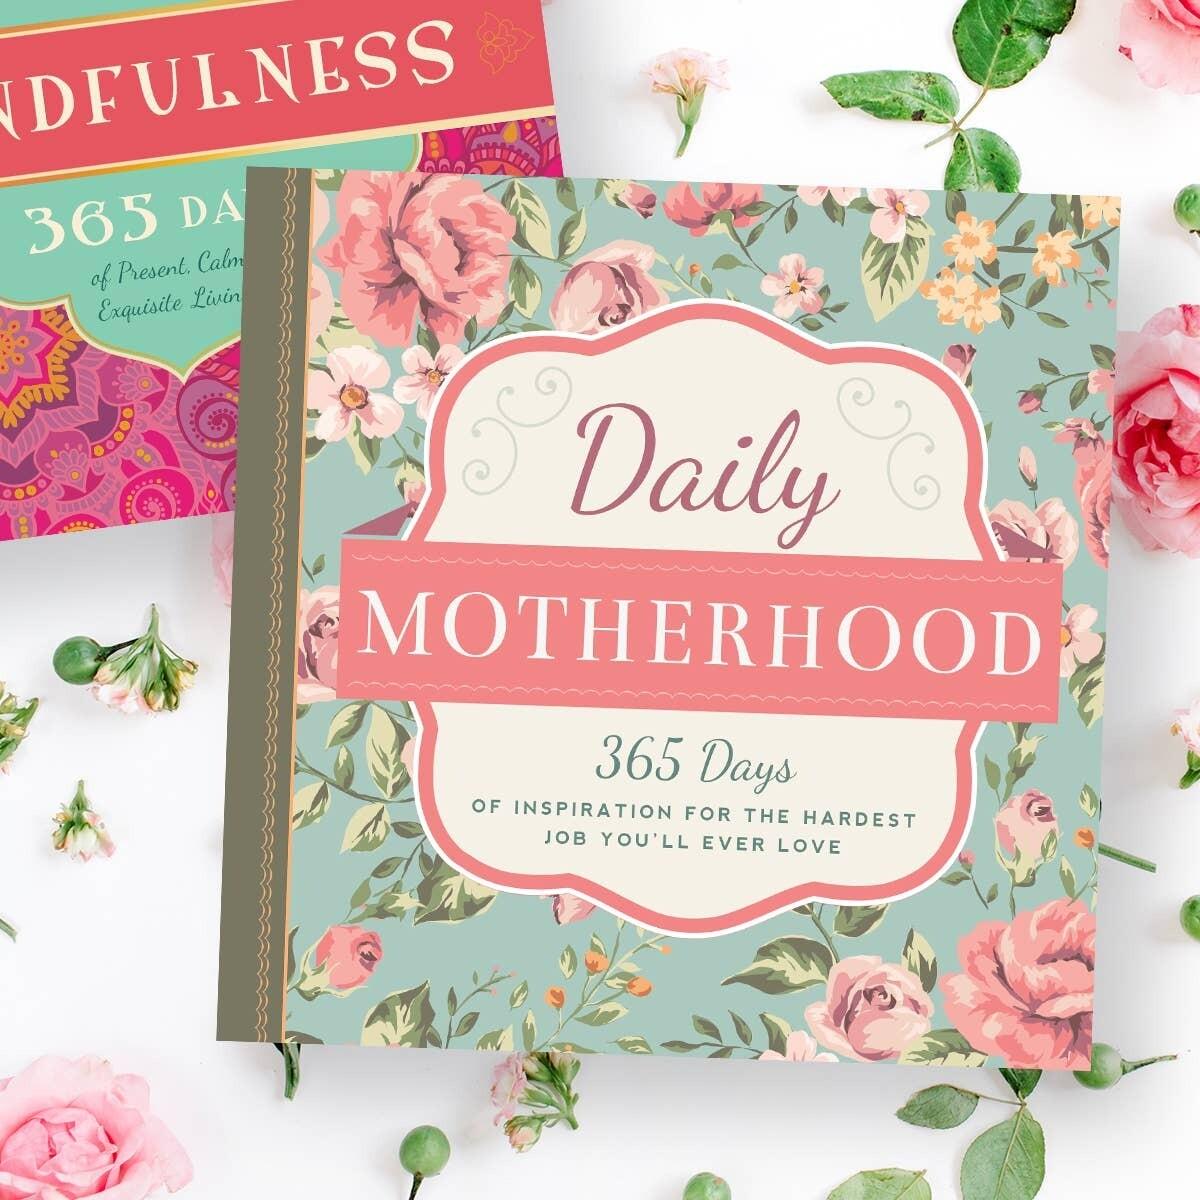 Daily Motherhood 365 Days of Inspiration